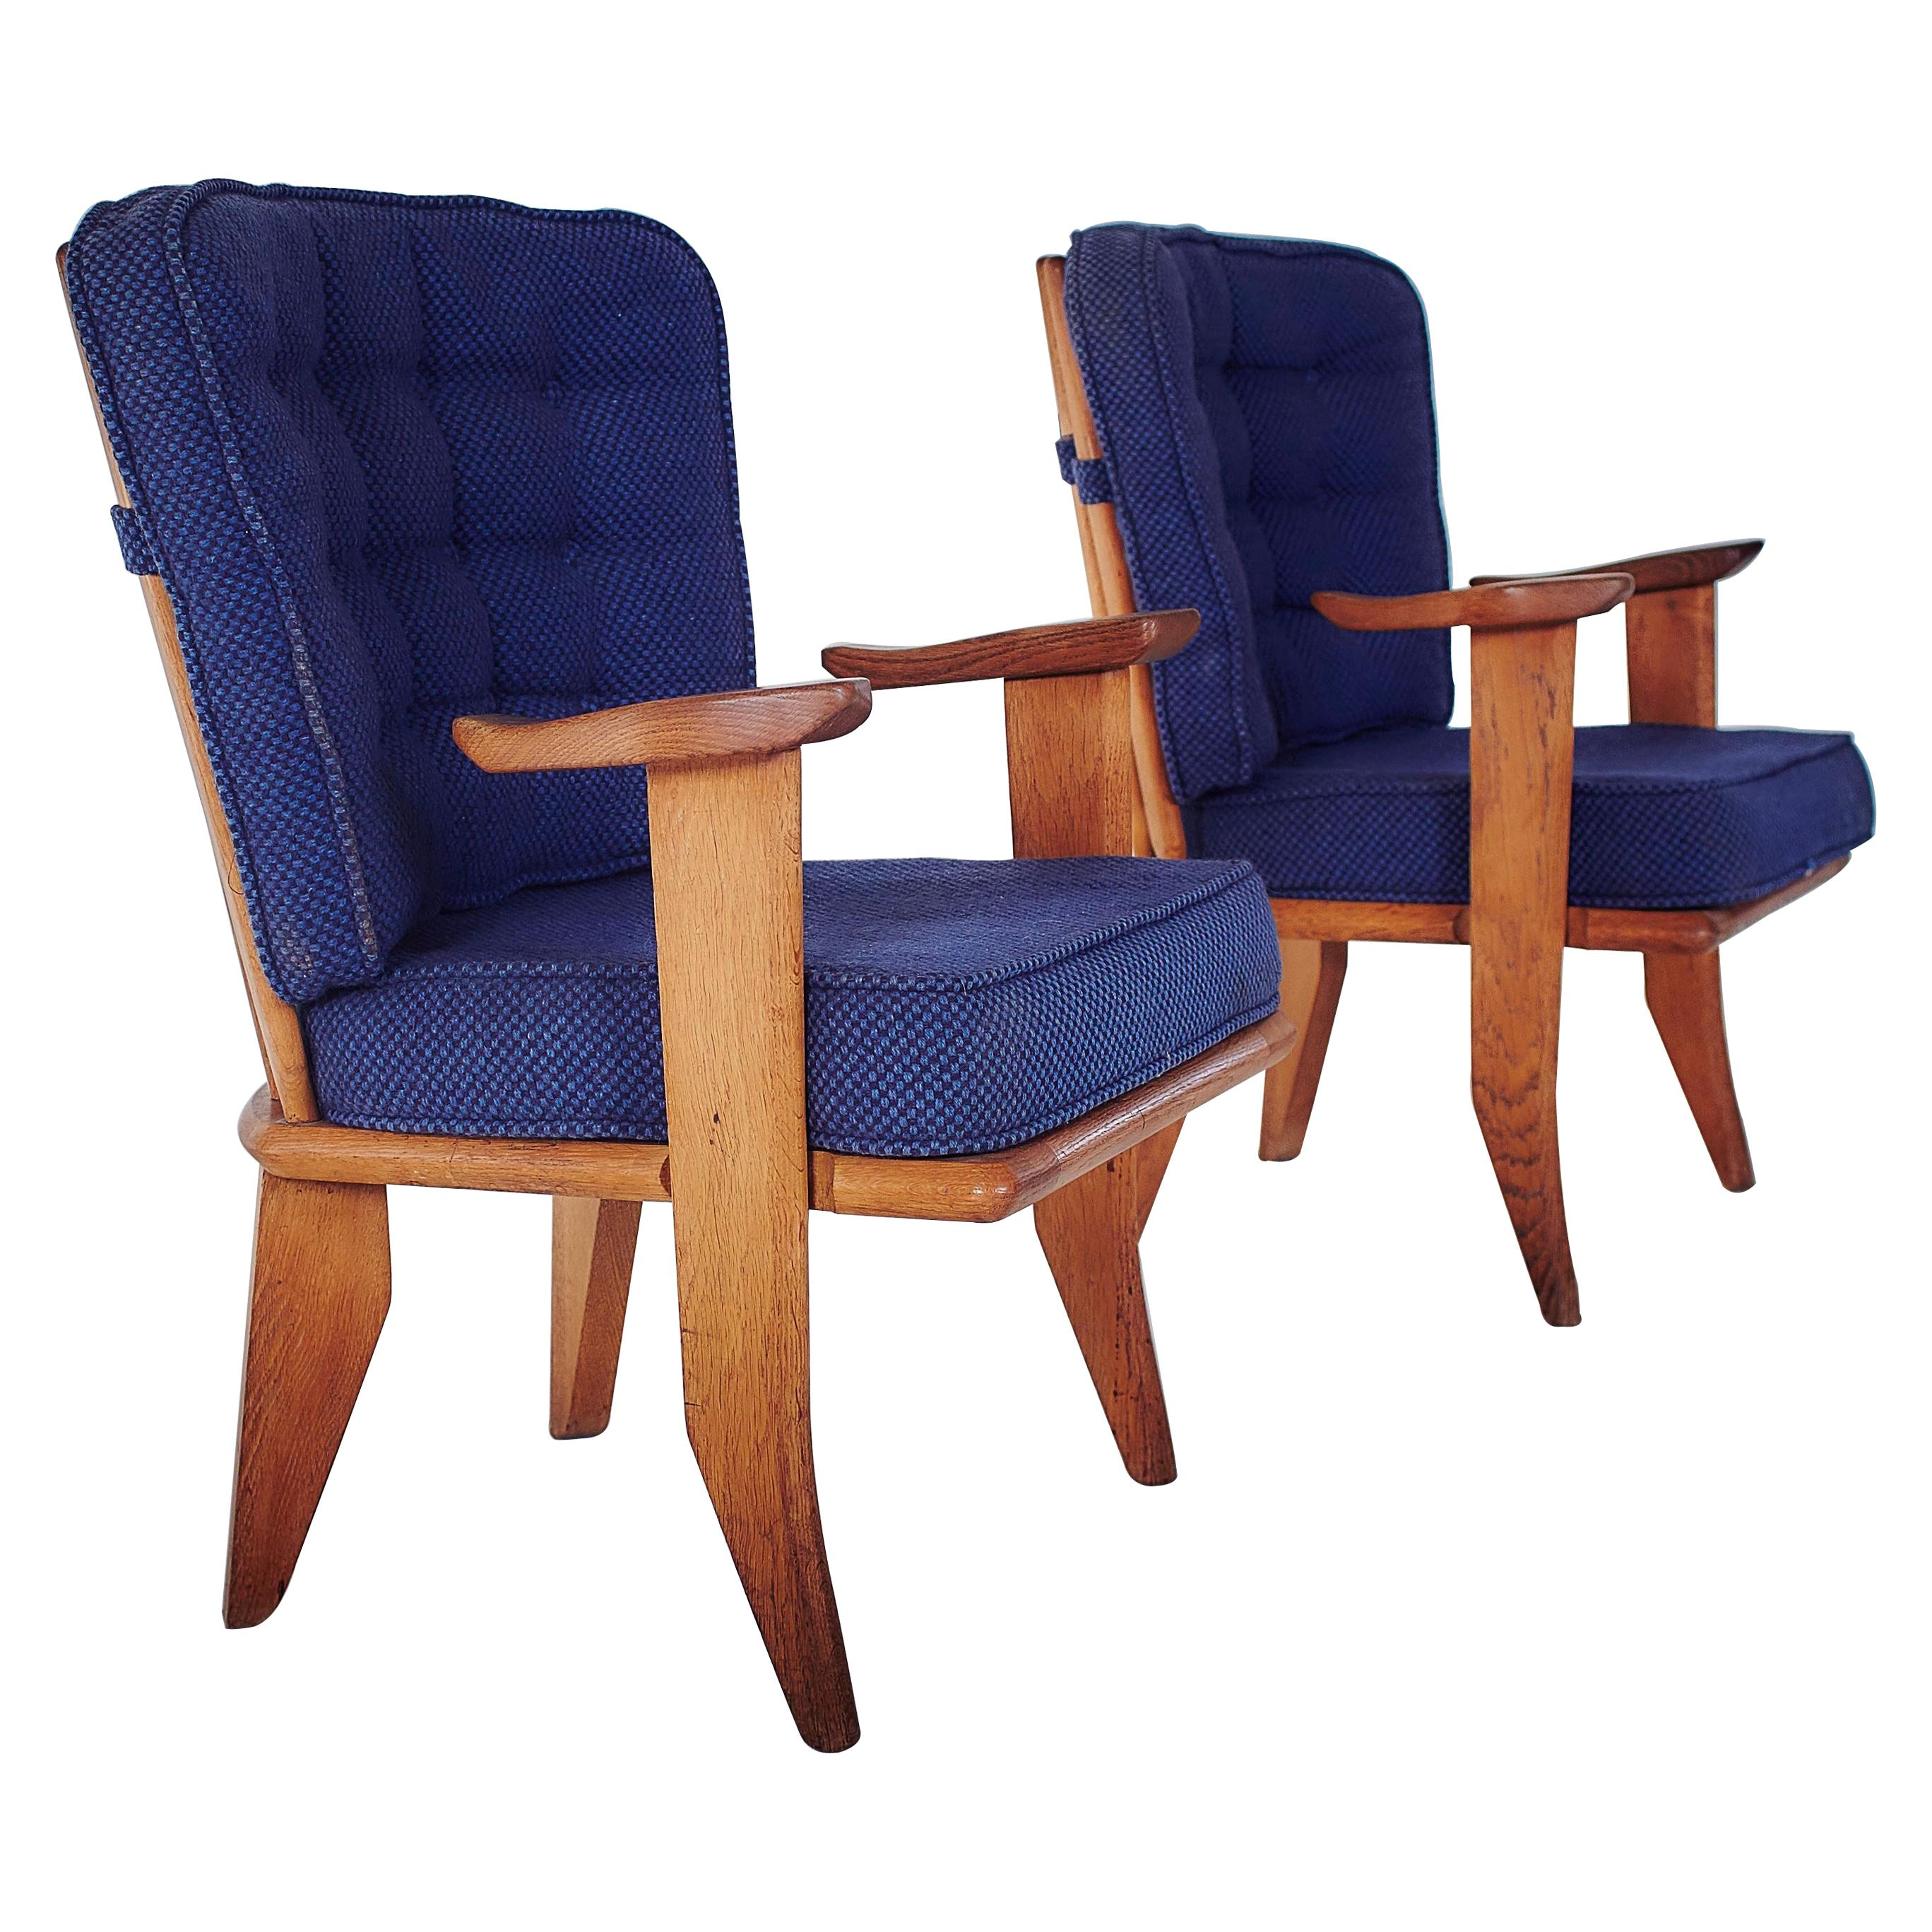 Guillerme et Chambron, Lounge Chairs, 1960s, Edited by Votre Maison